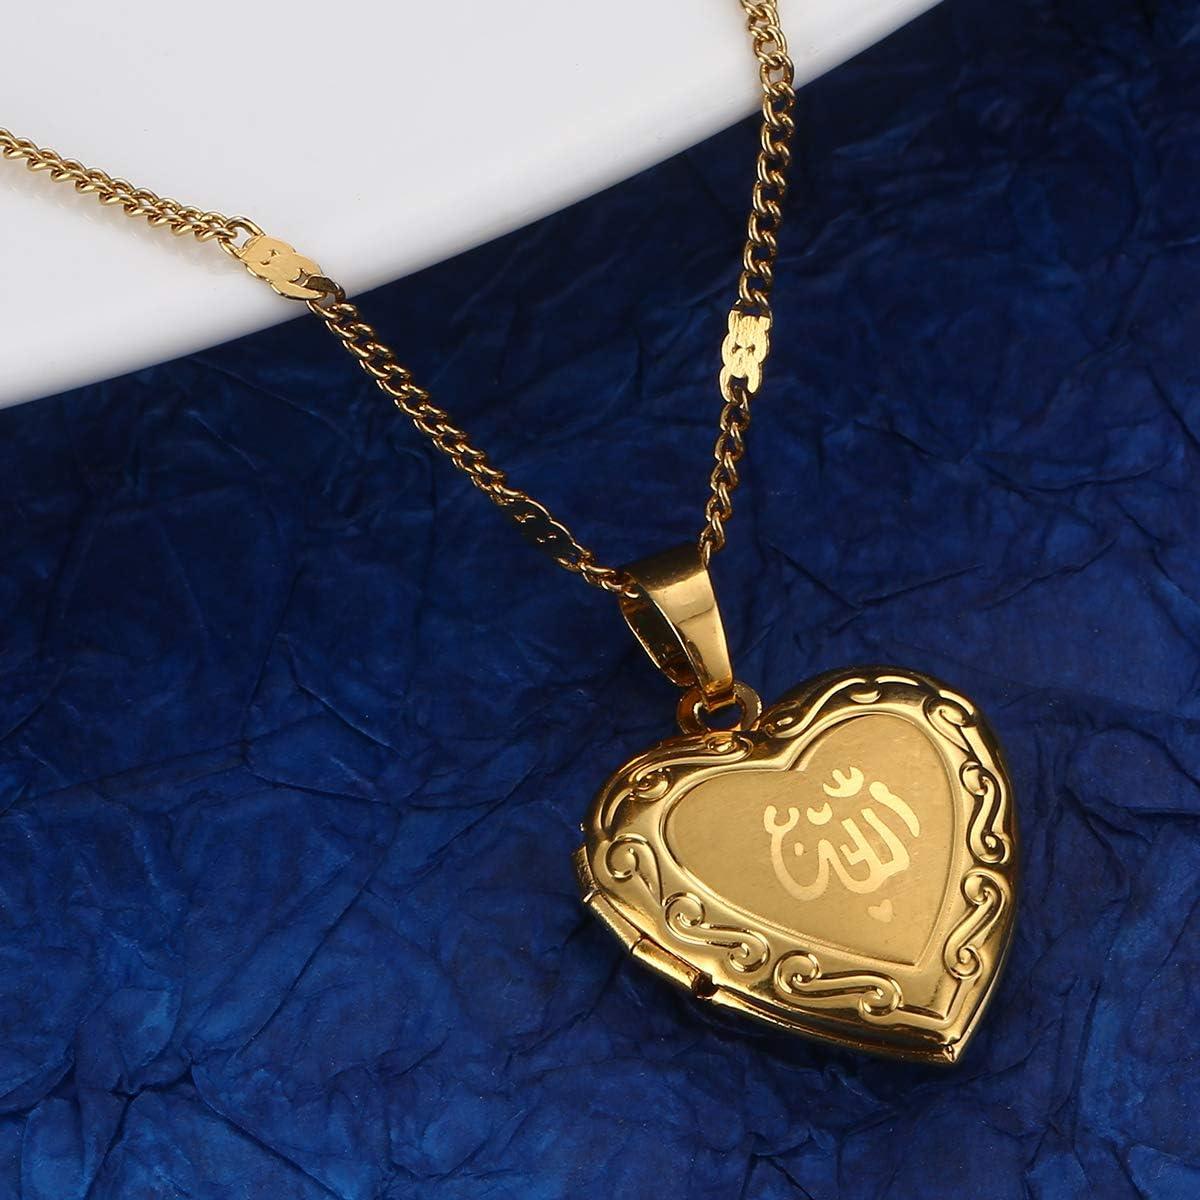 Yongkan Jewelry Allah Heart Locket Pendant Necklace Muslim Heart Allah Open Heart Pendnat Necklace with Chain